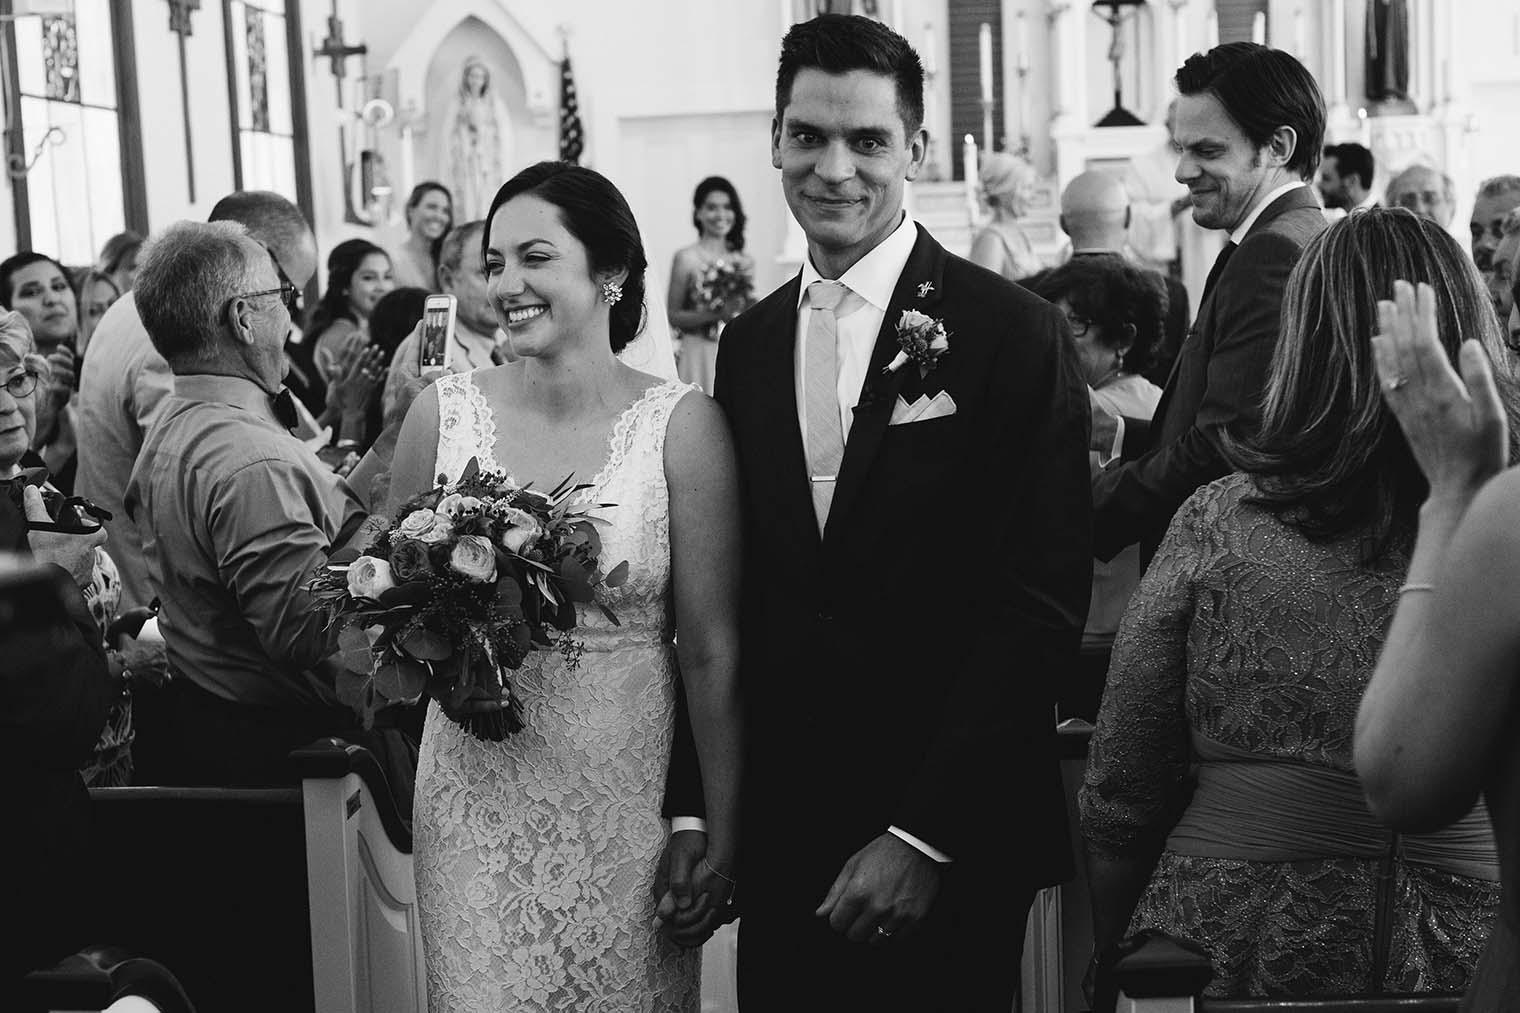 Saint Teresa of Avila Church wedding ceremony